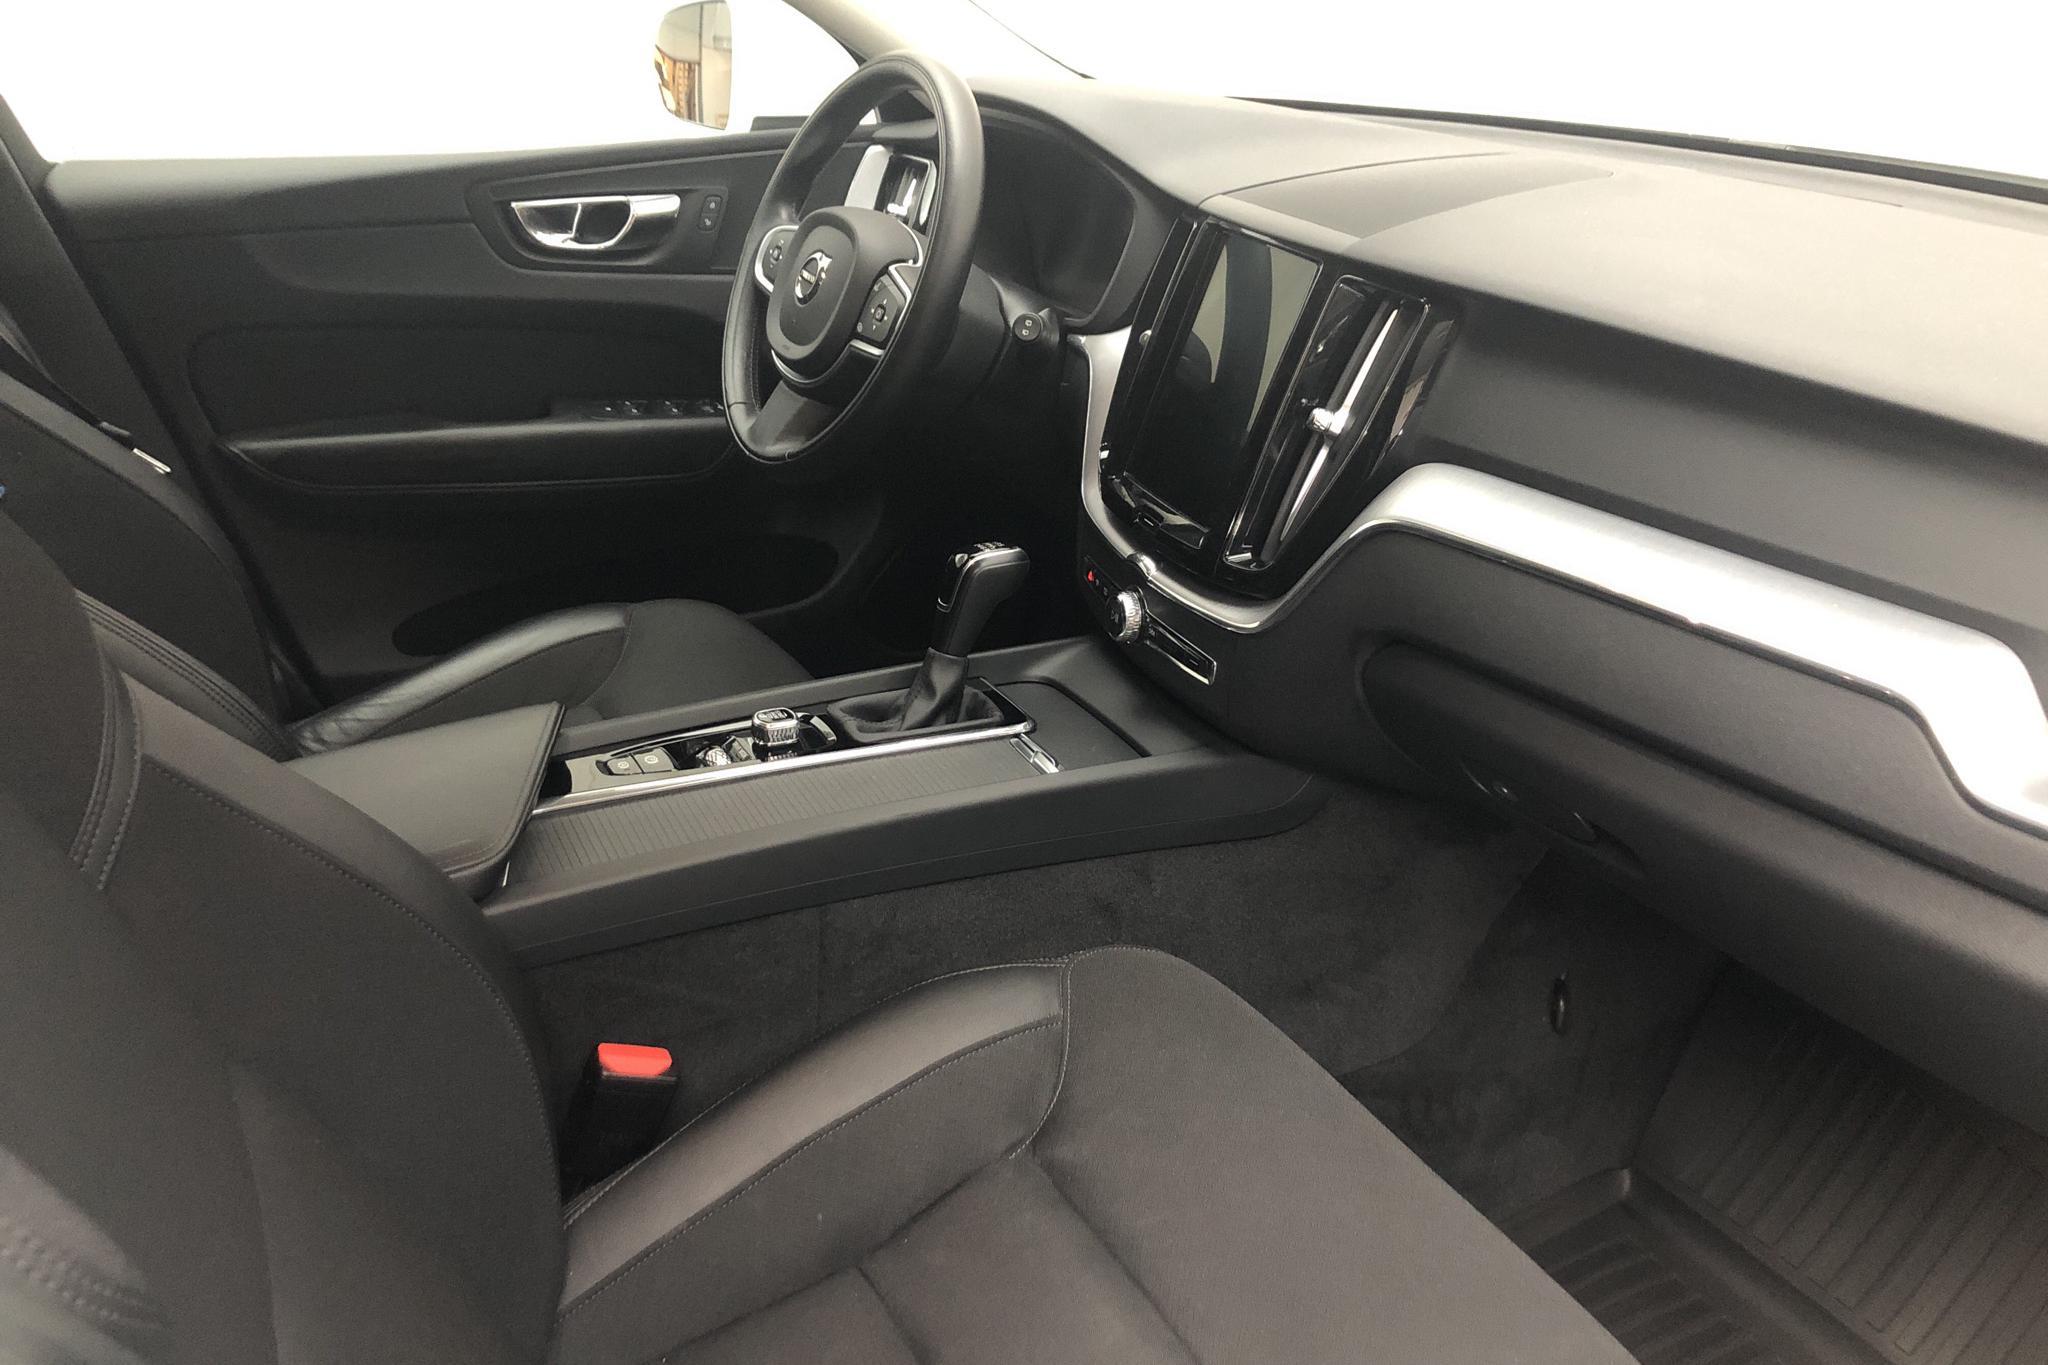 Volvo XC60 D4 AWD (190hk) - 31 730 km - Manual - white - 2018